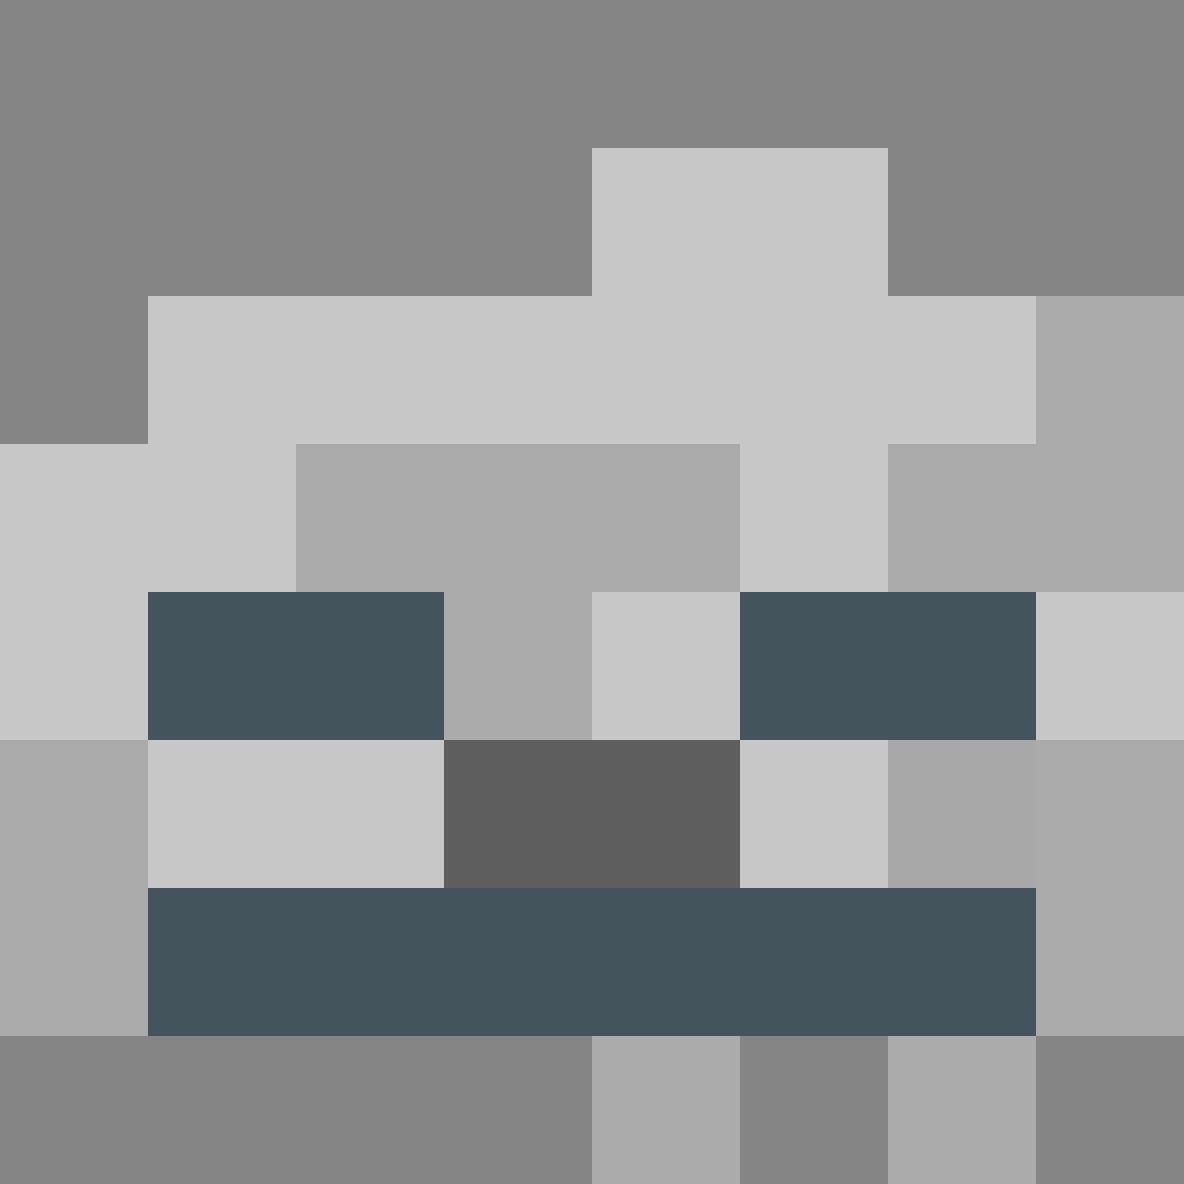 Pixilart Minecraft By Enderapple597